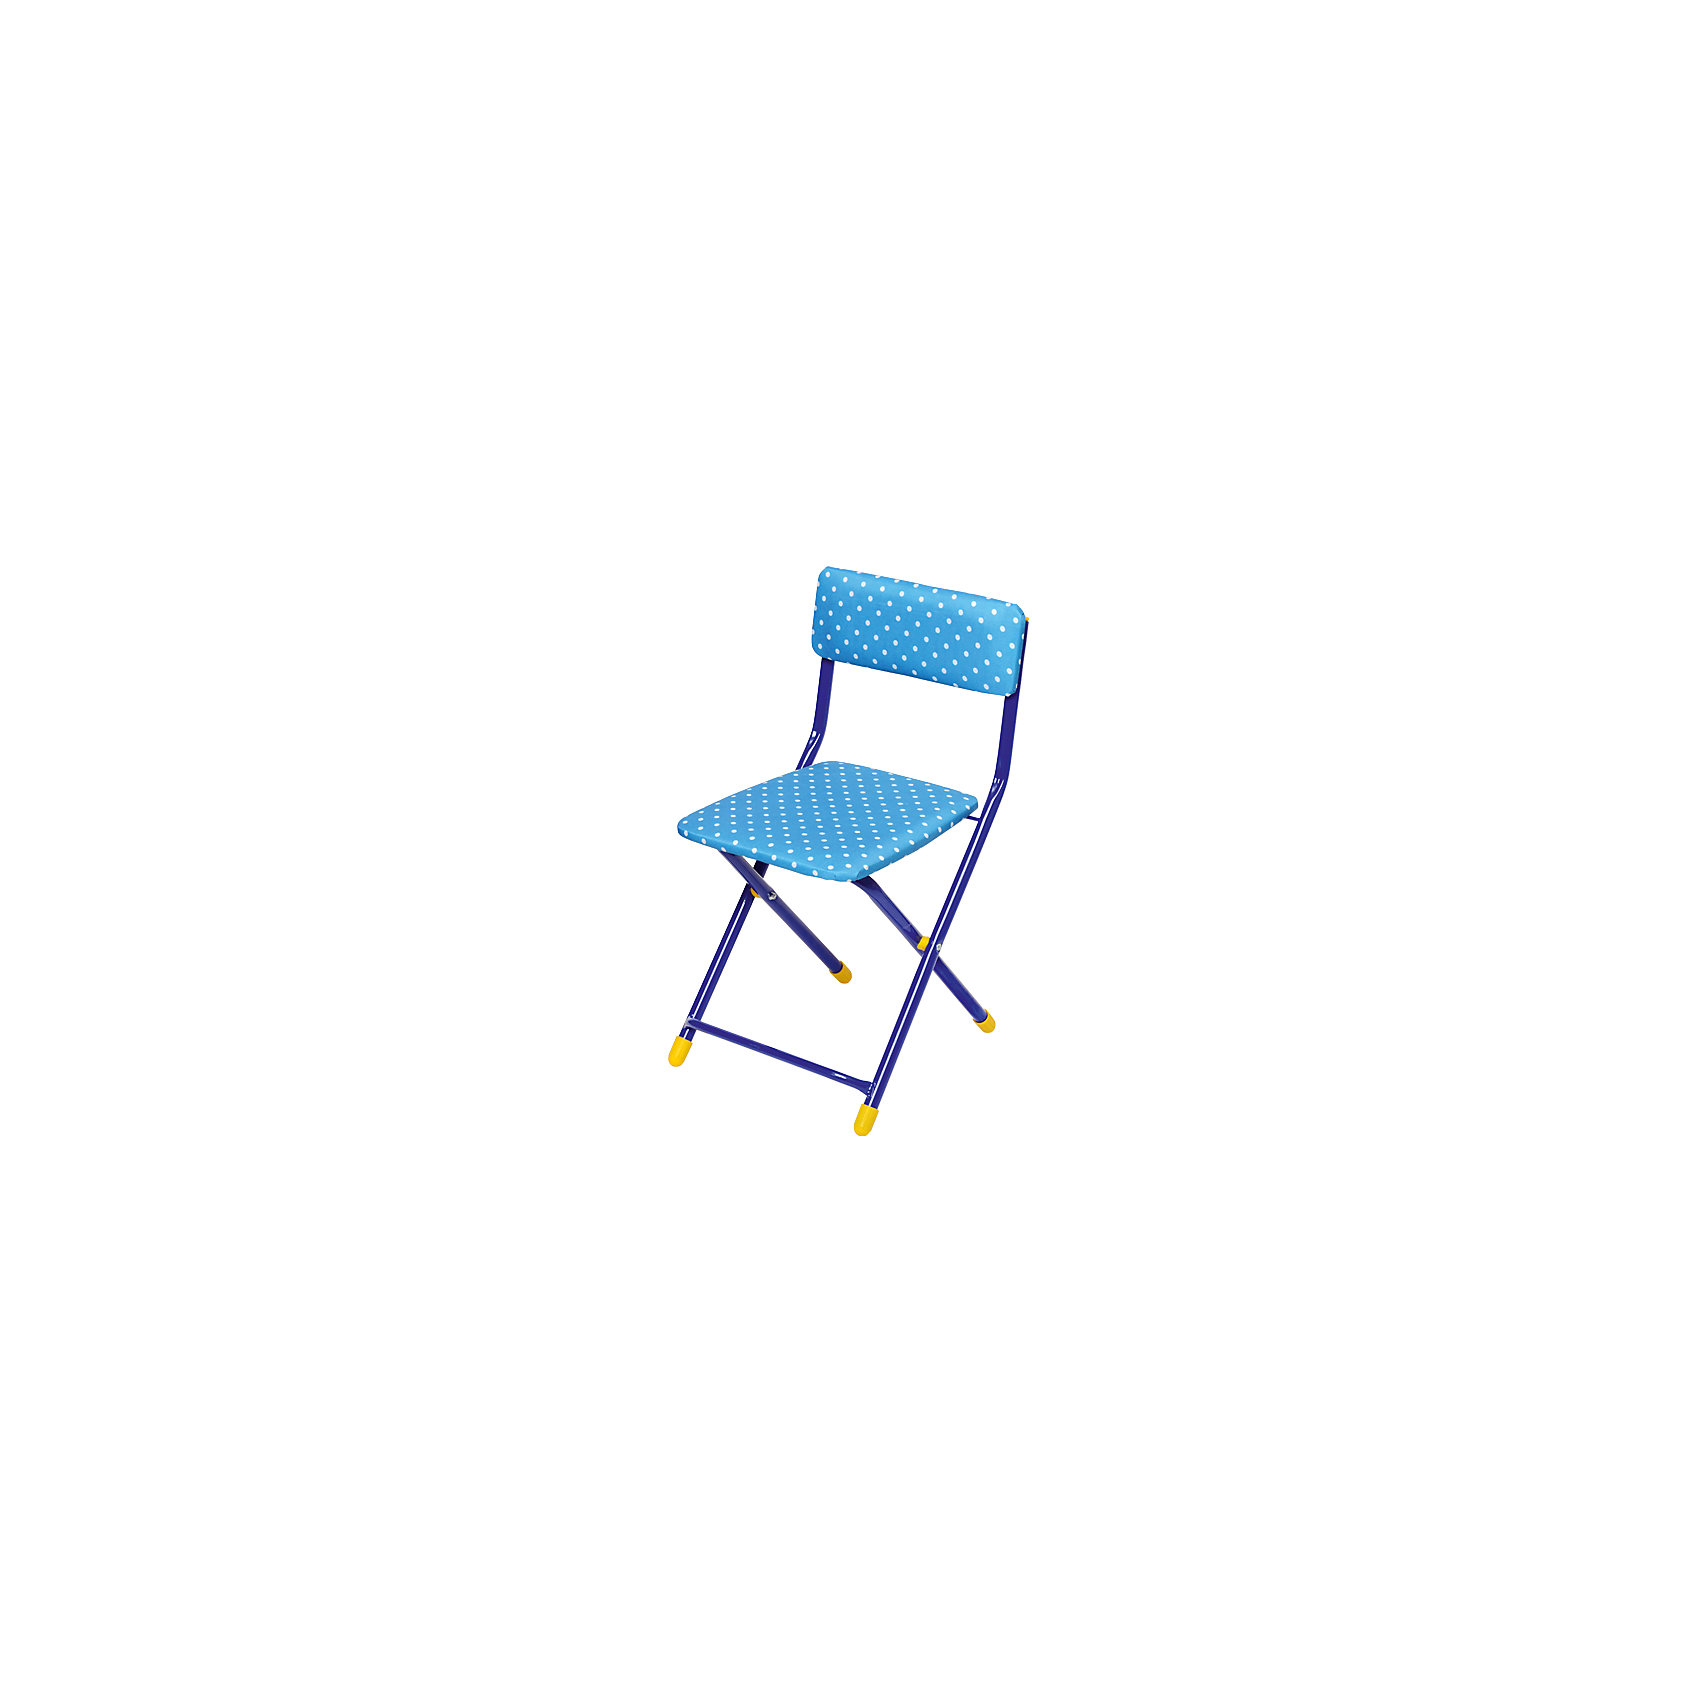 Складной стул СТУ3 «Горошек», Ника, синий  дитячі тумбочки